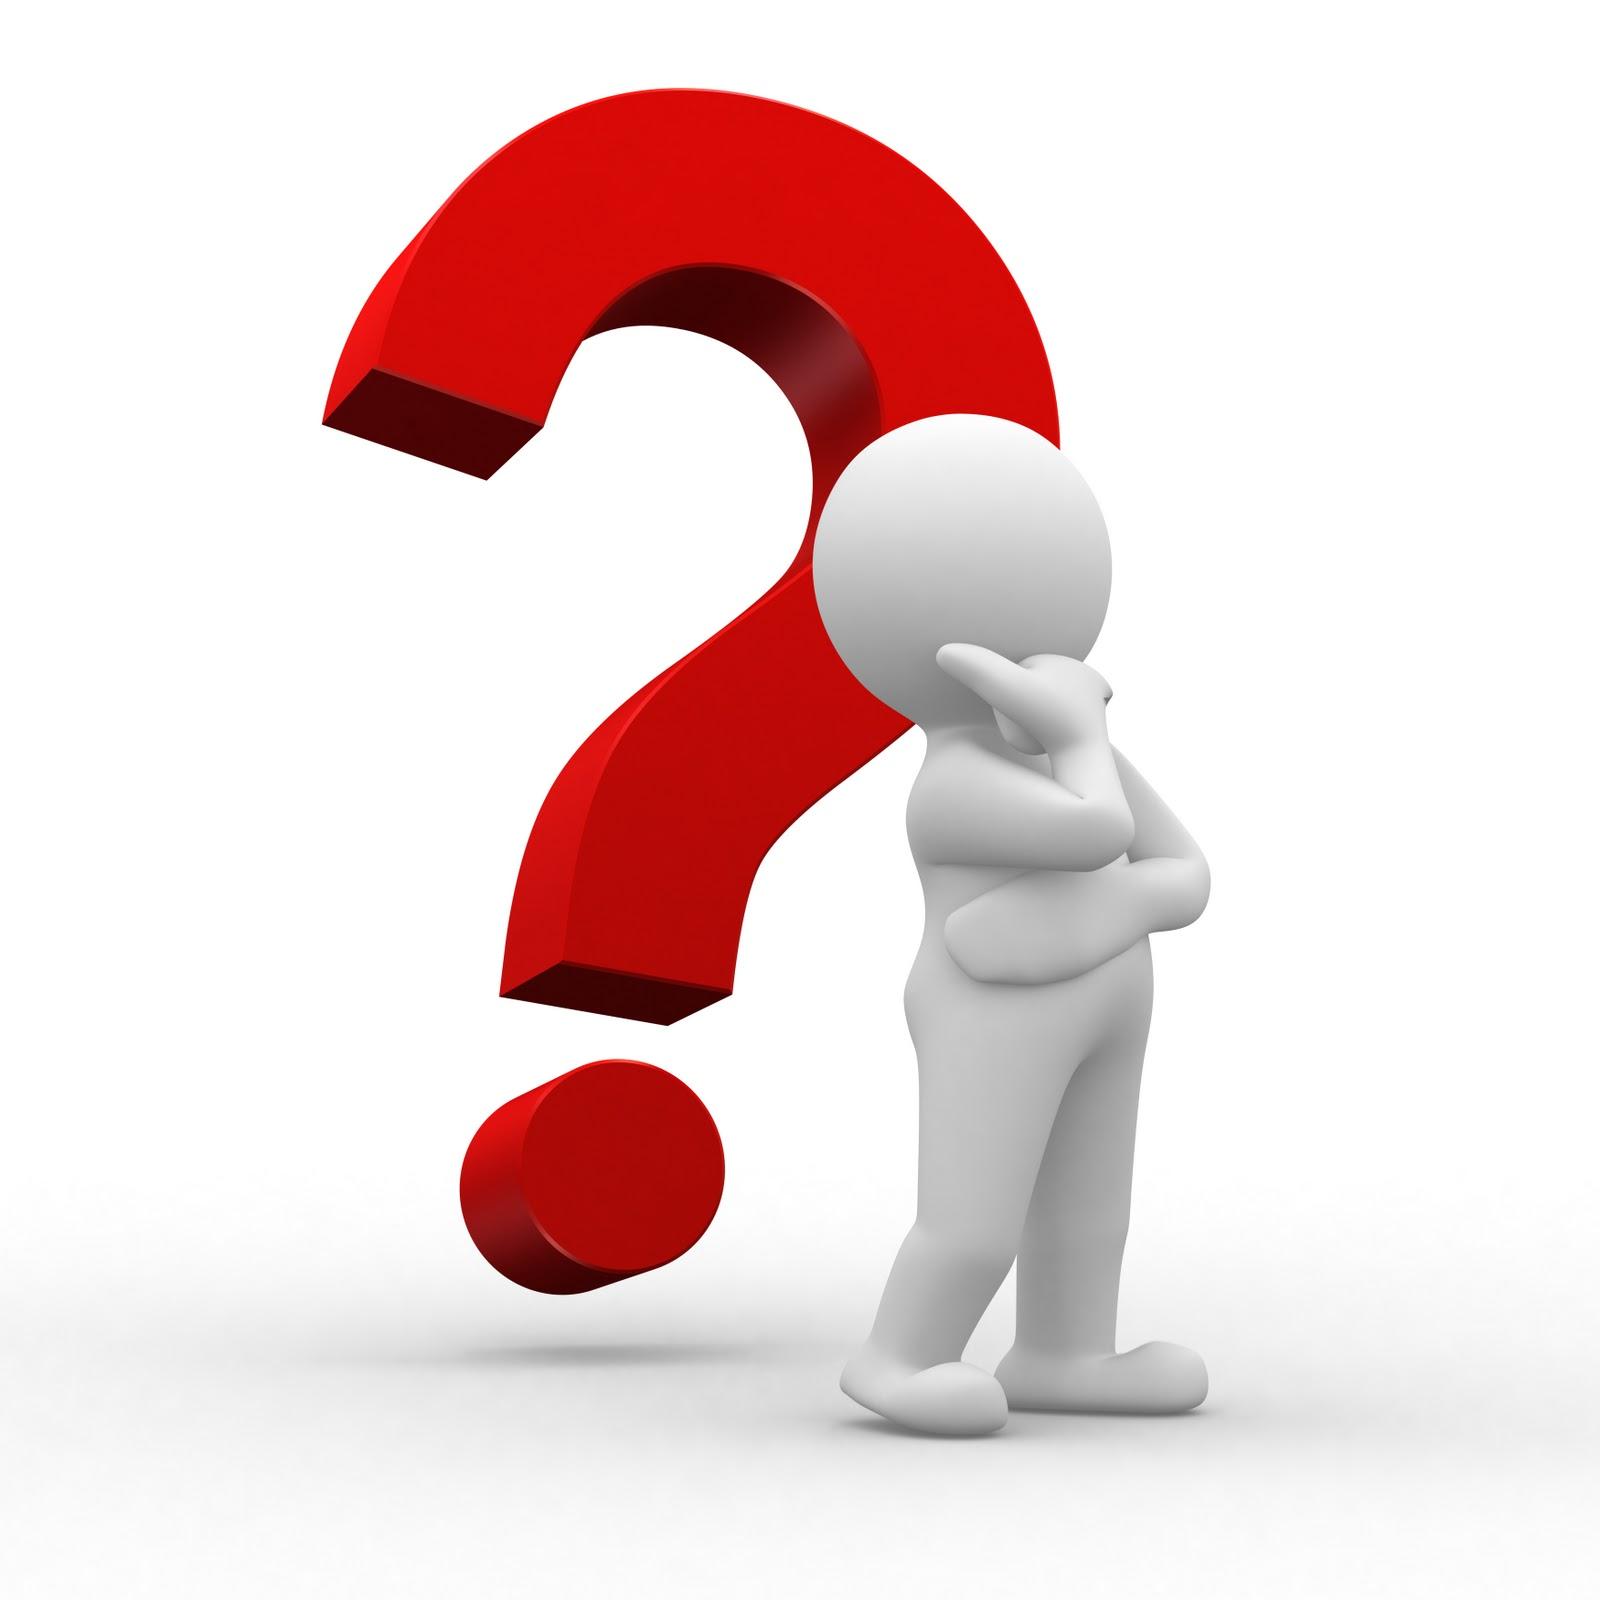 Questions powerpoint question mark clip art.